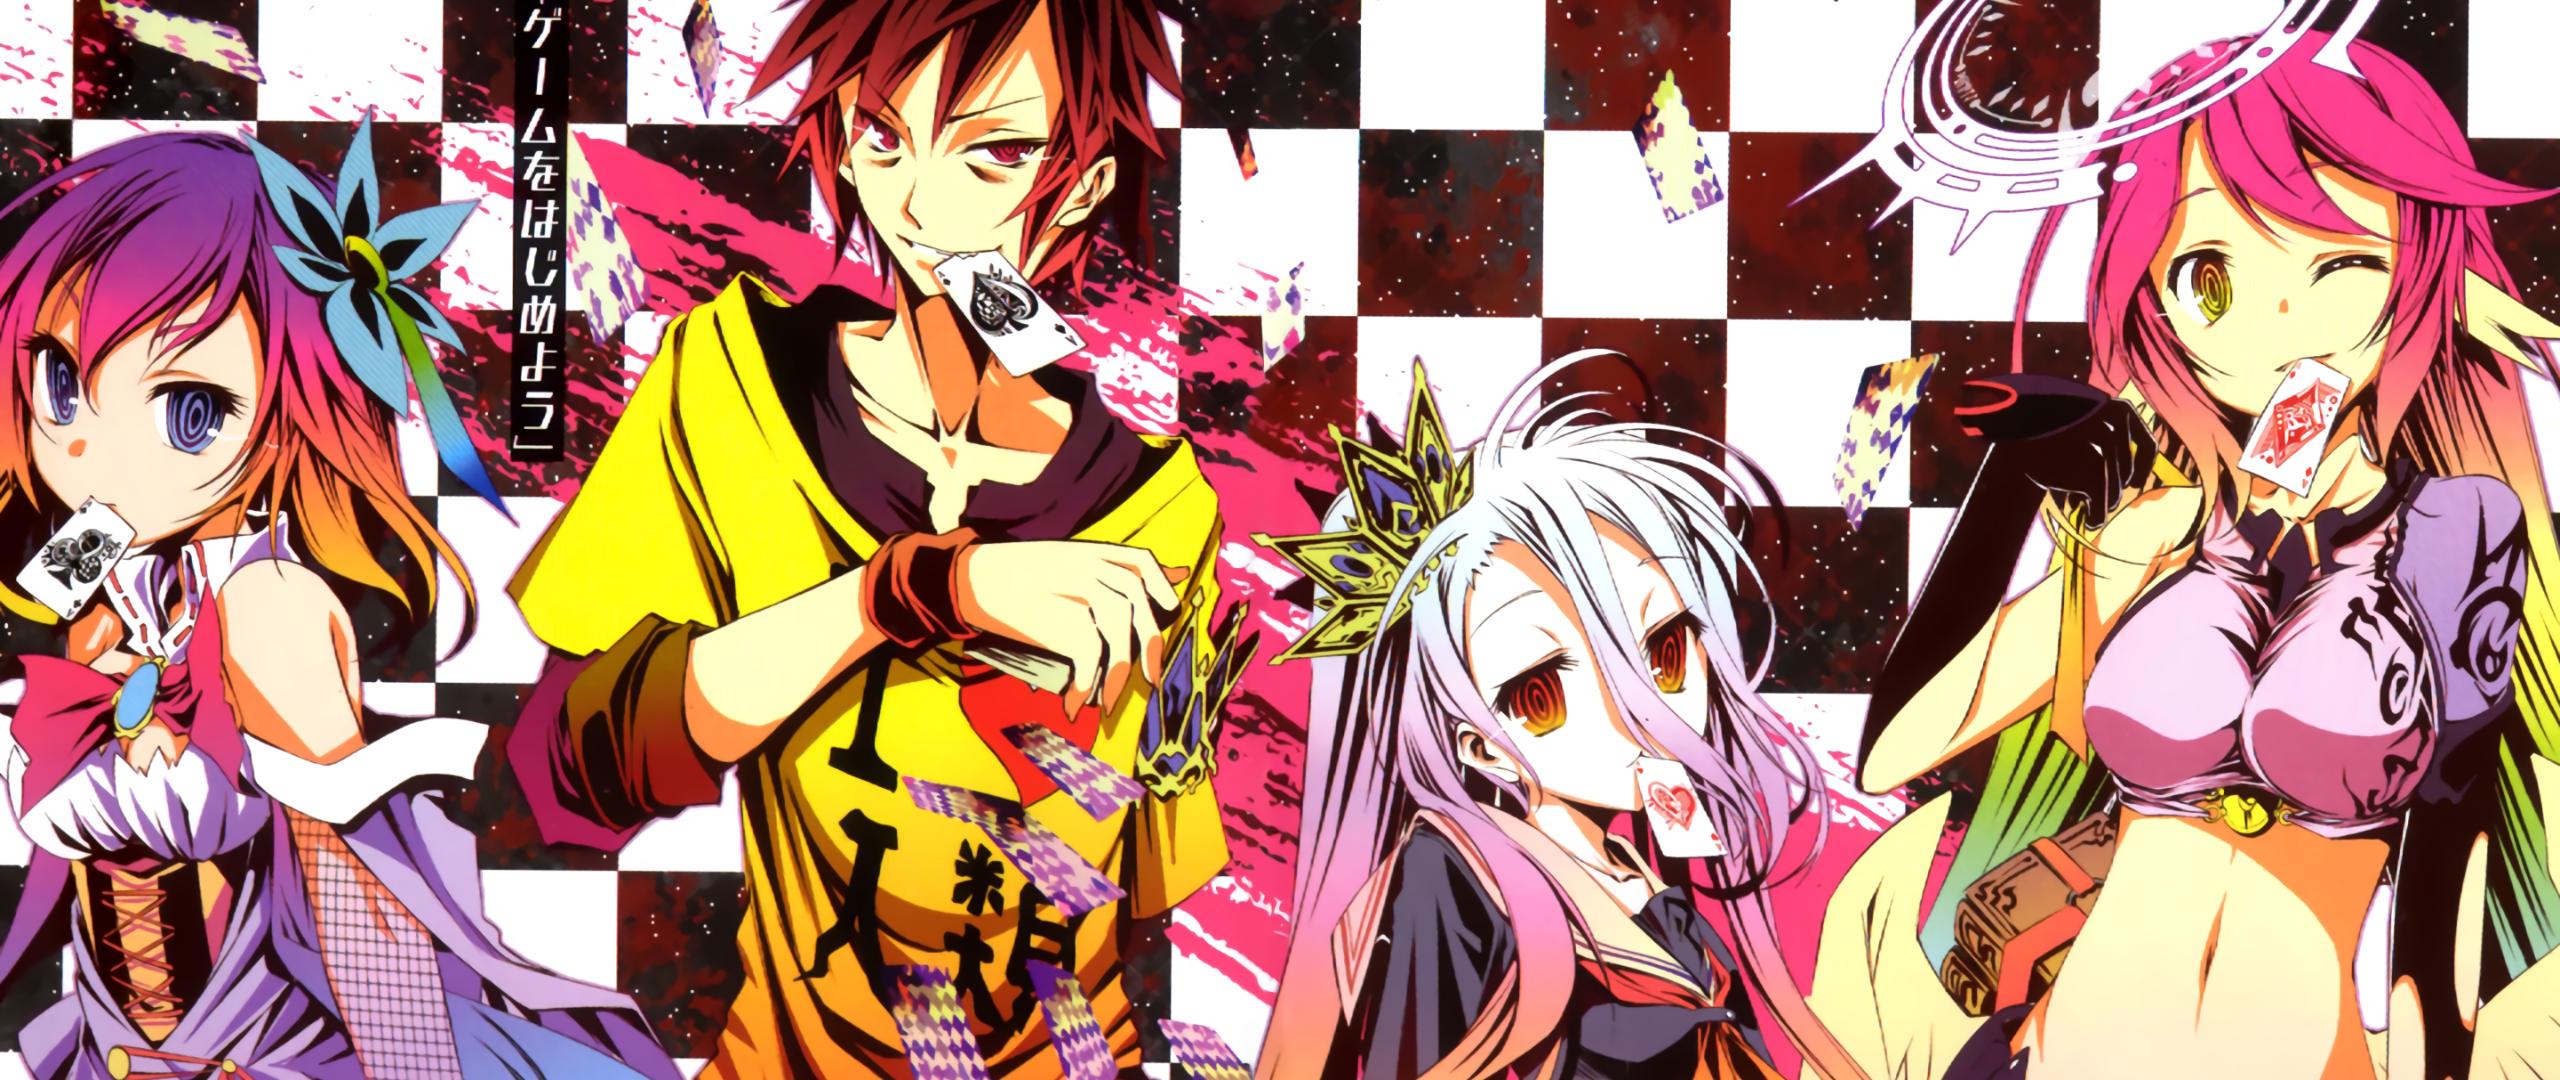 Wallpaper : Illustration, Anime, Sora No Game No Life, No